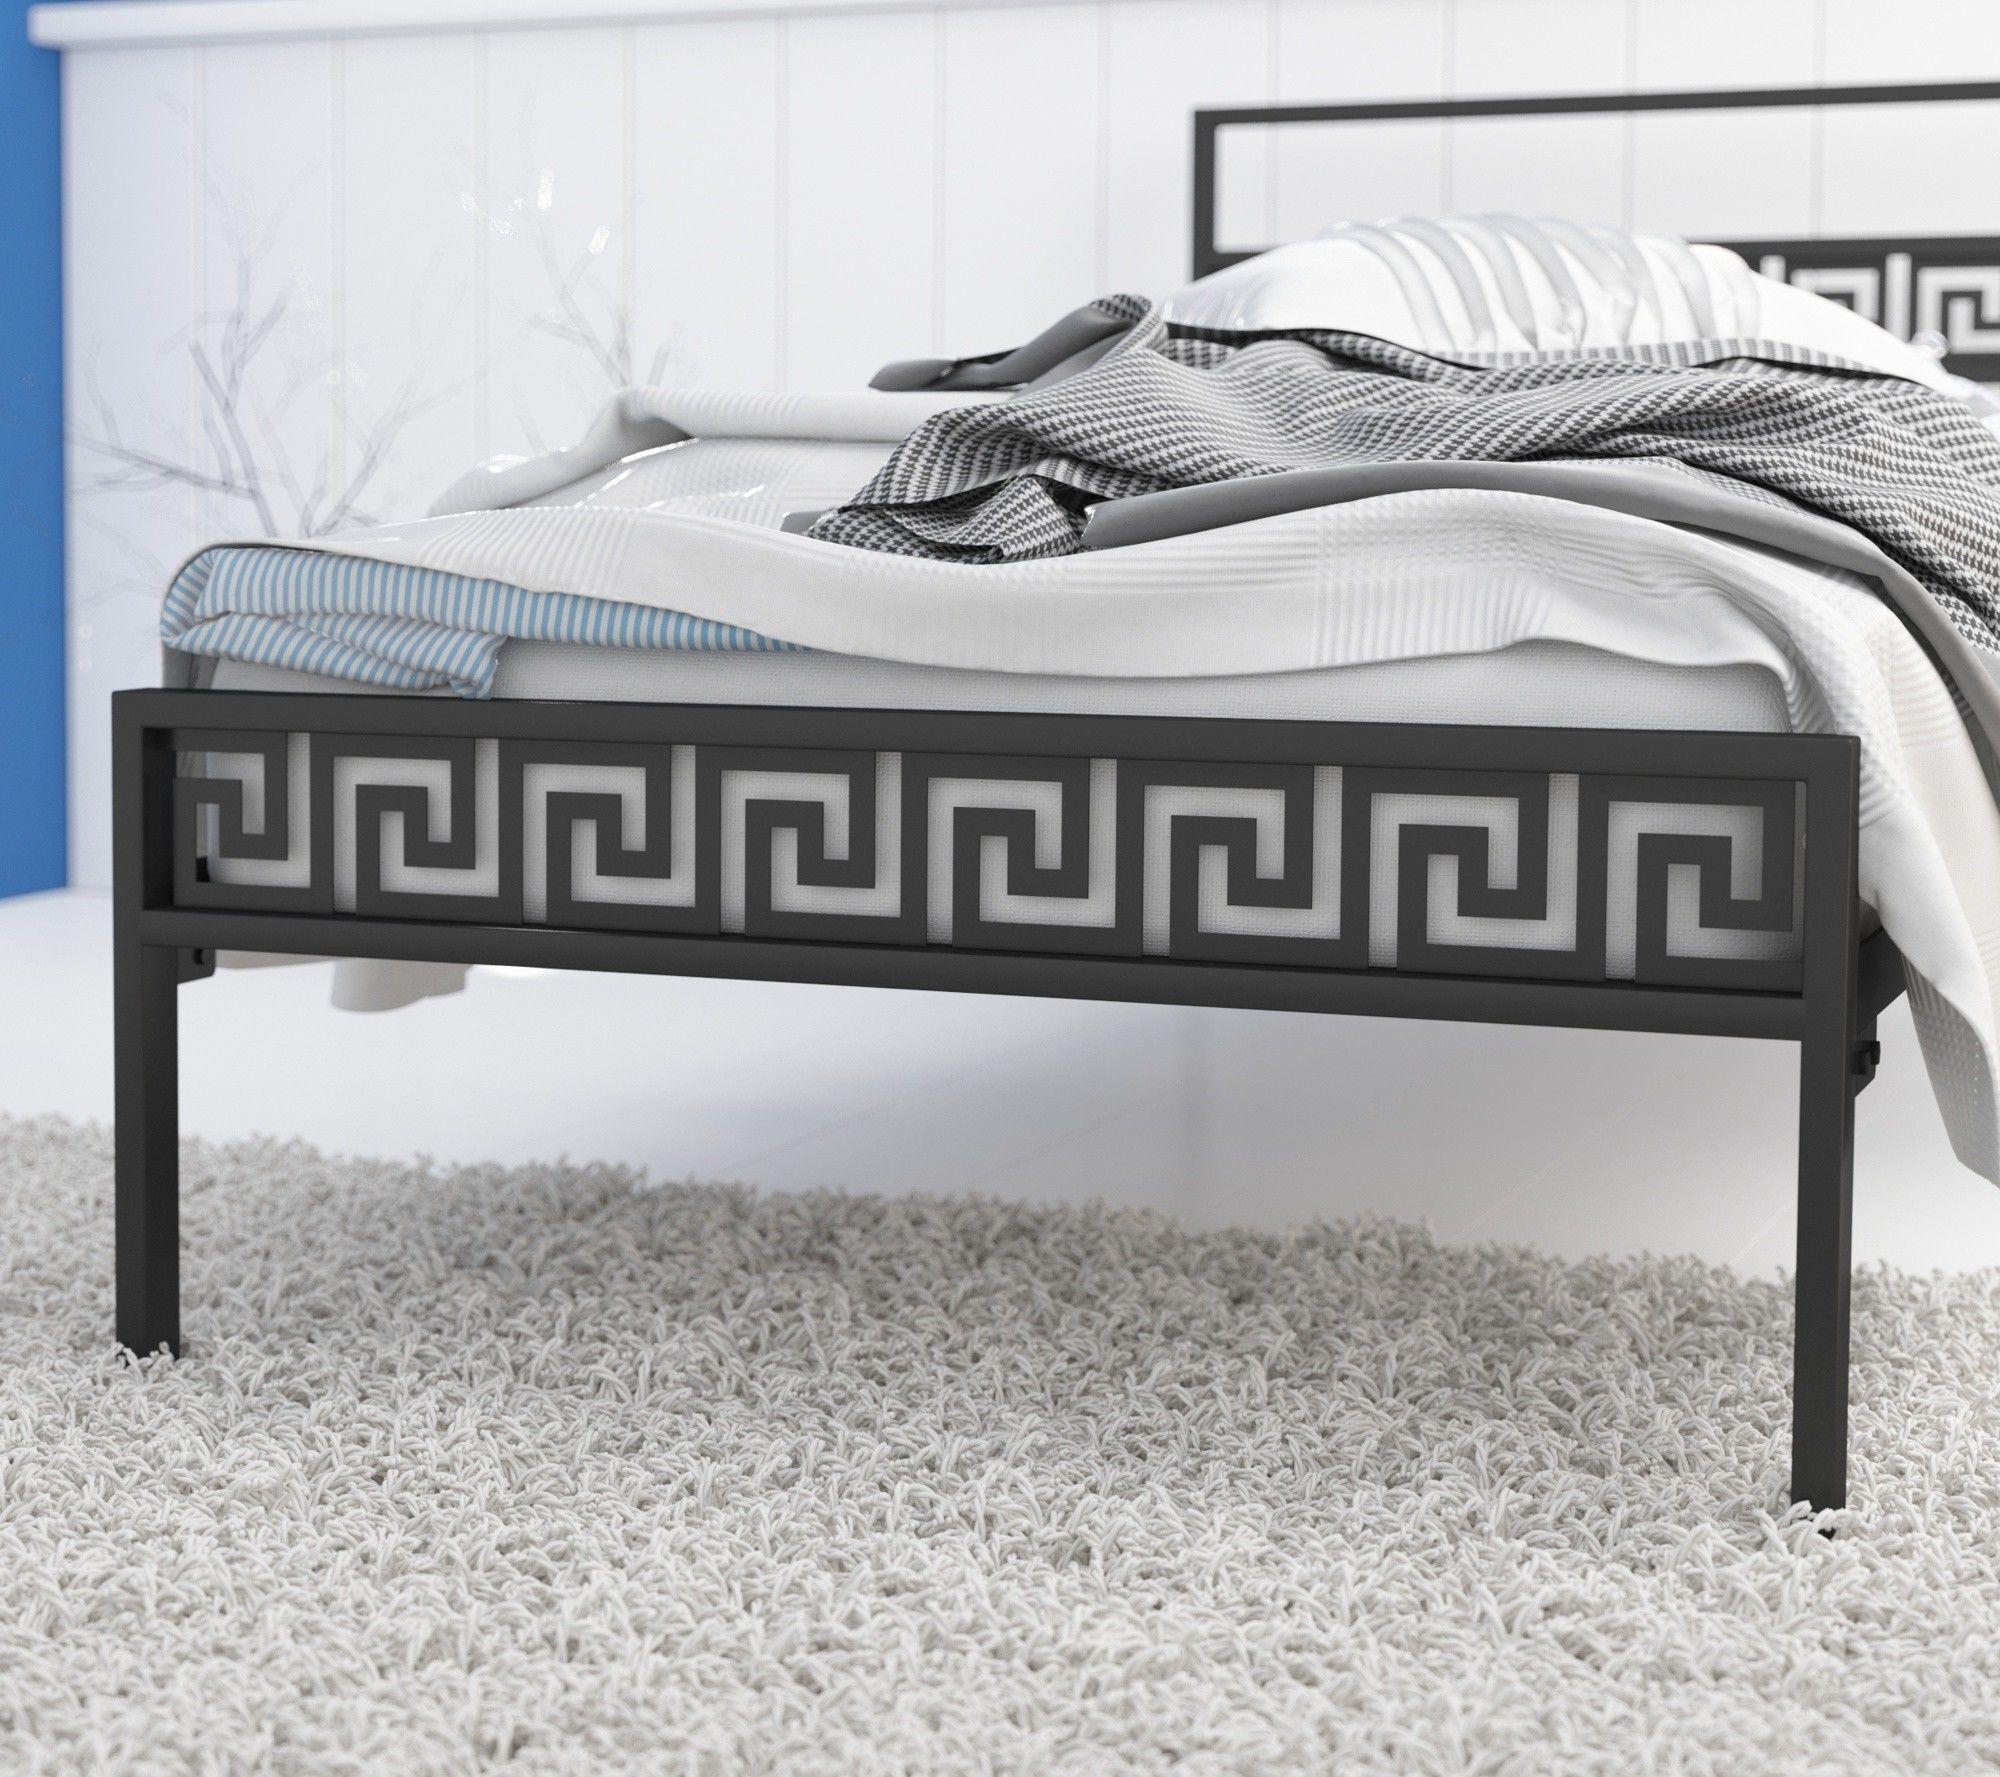 Łóżko metalowe 80x190 wzór 9 ze stelażem